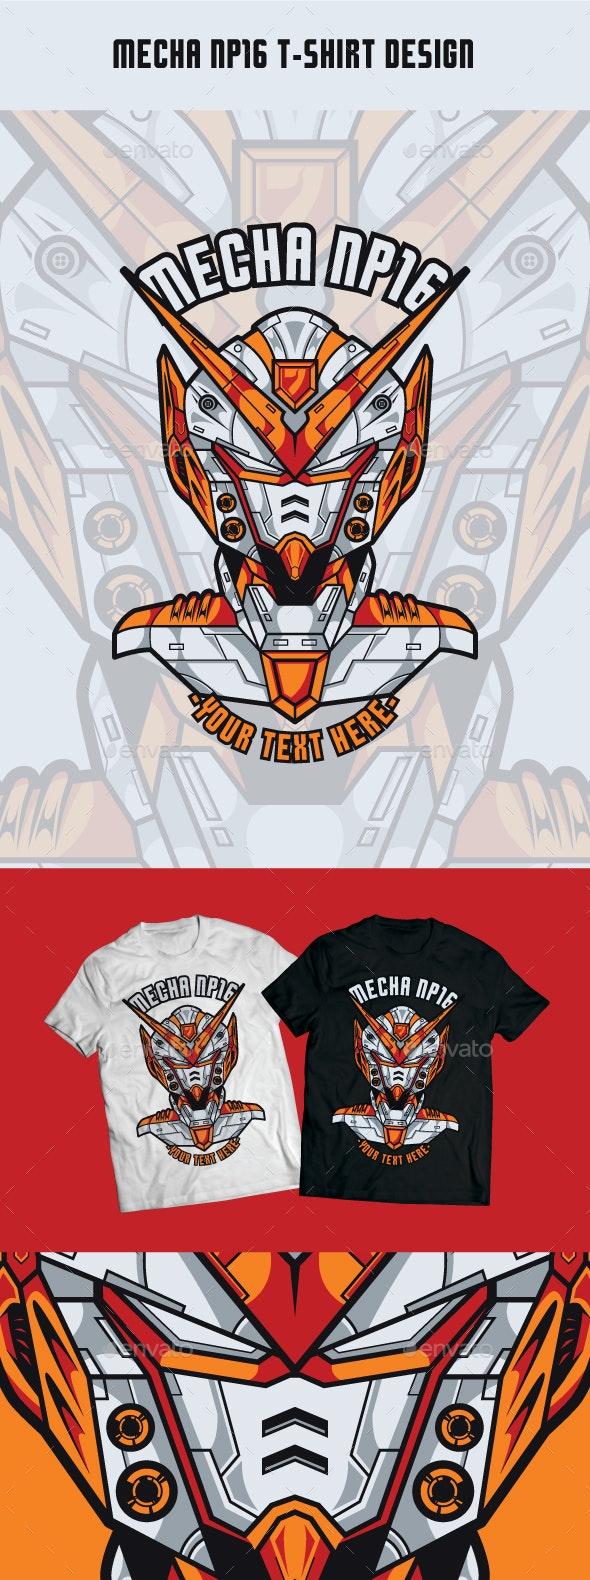 Mecha NP16 T-Shirt Design - T-Shirts